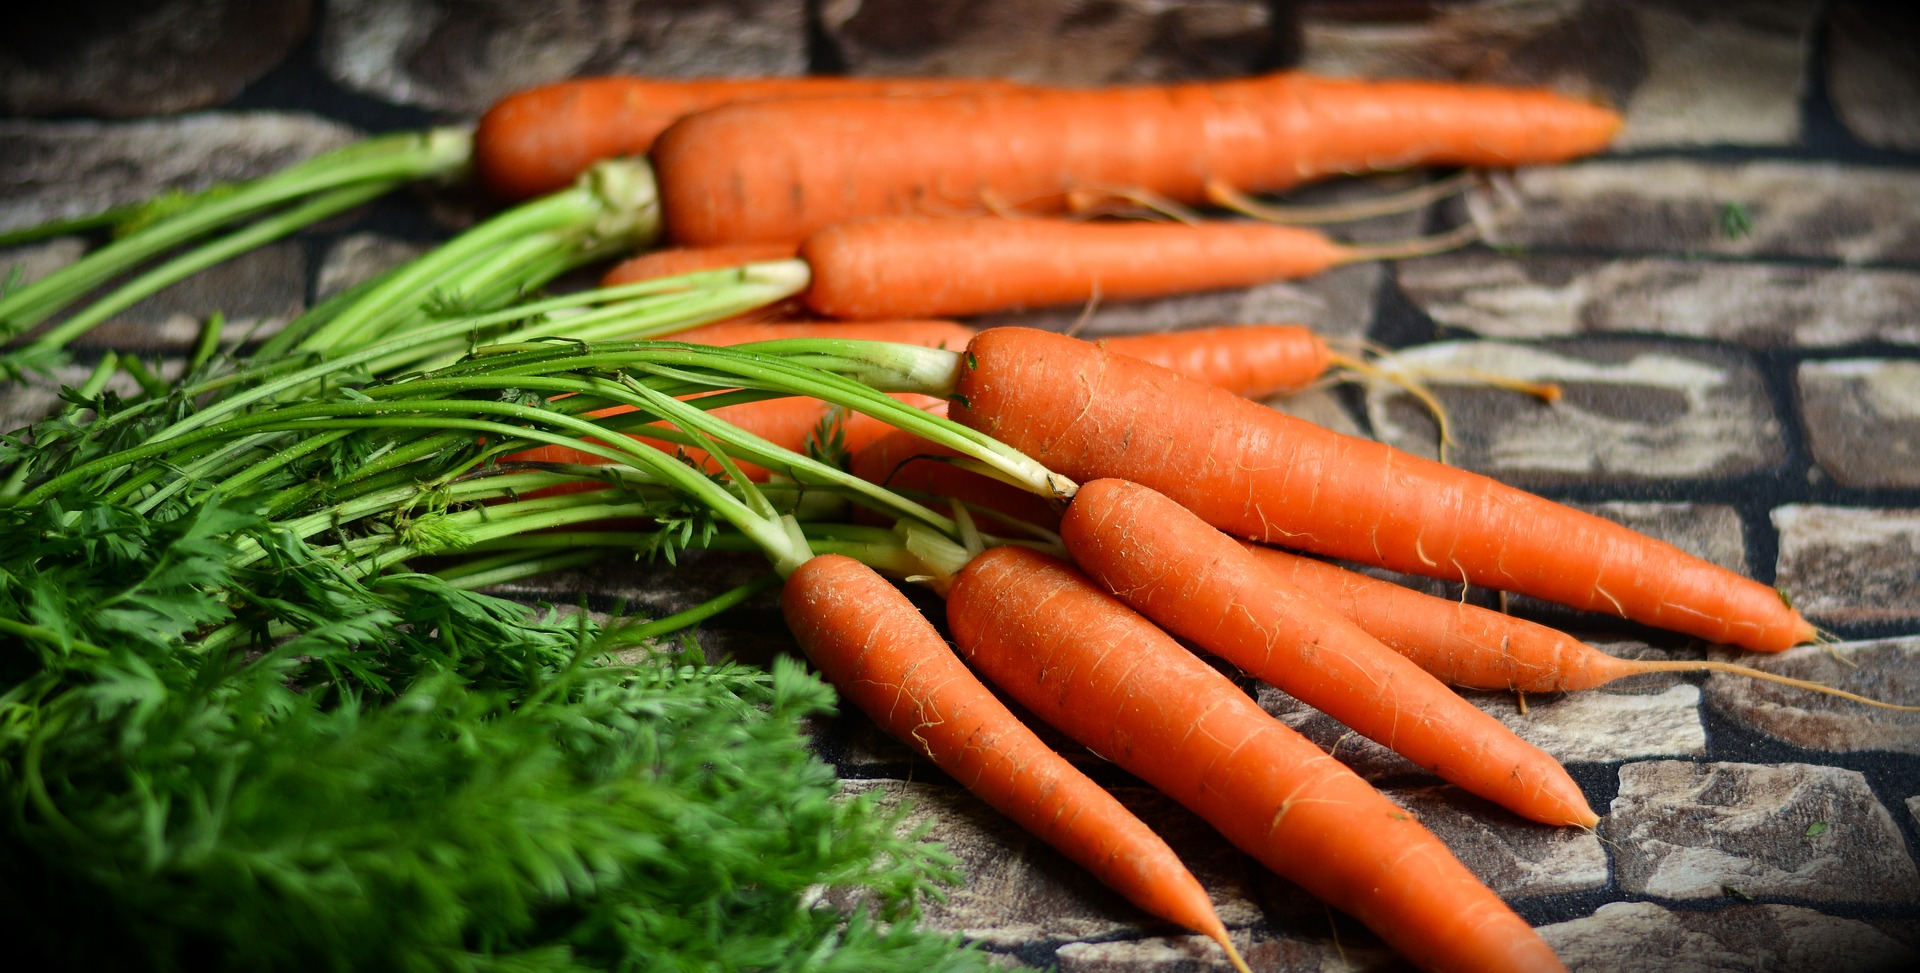 carrots-2387394_1920.jpg